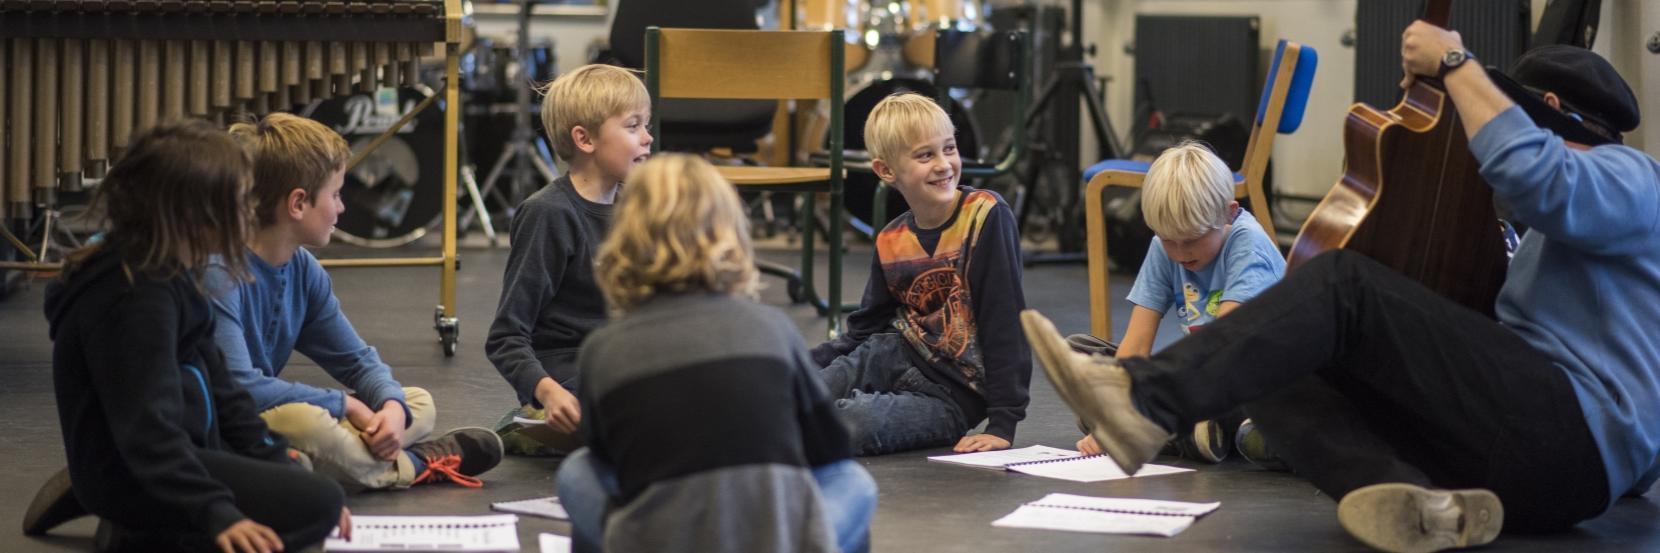 Musikskole-elever